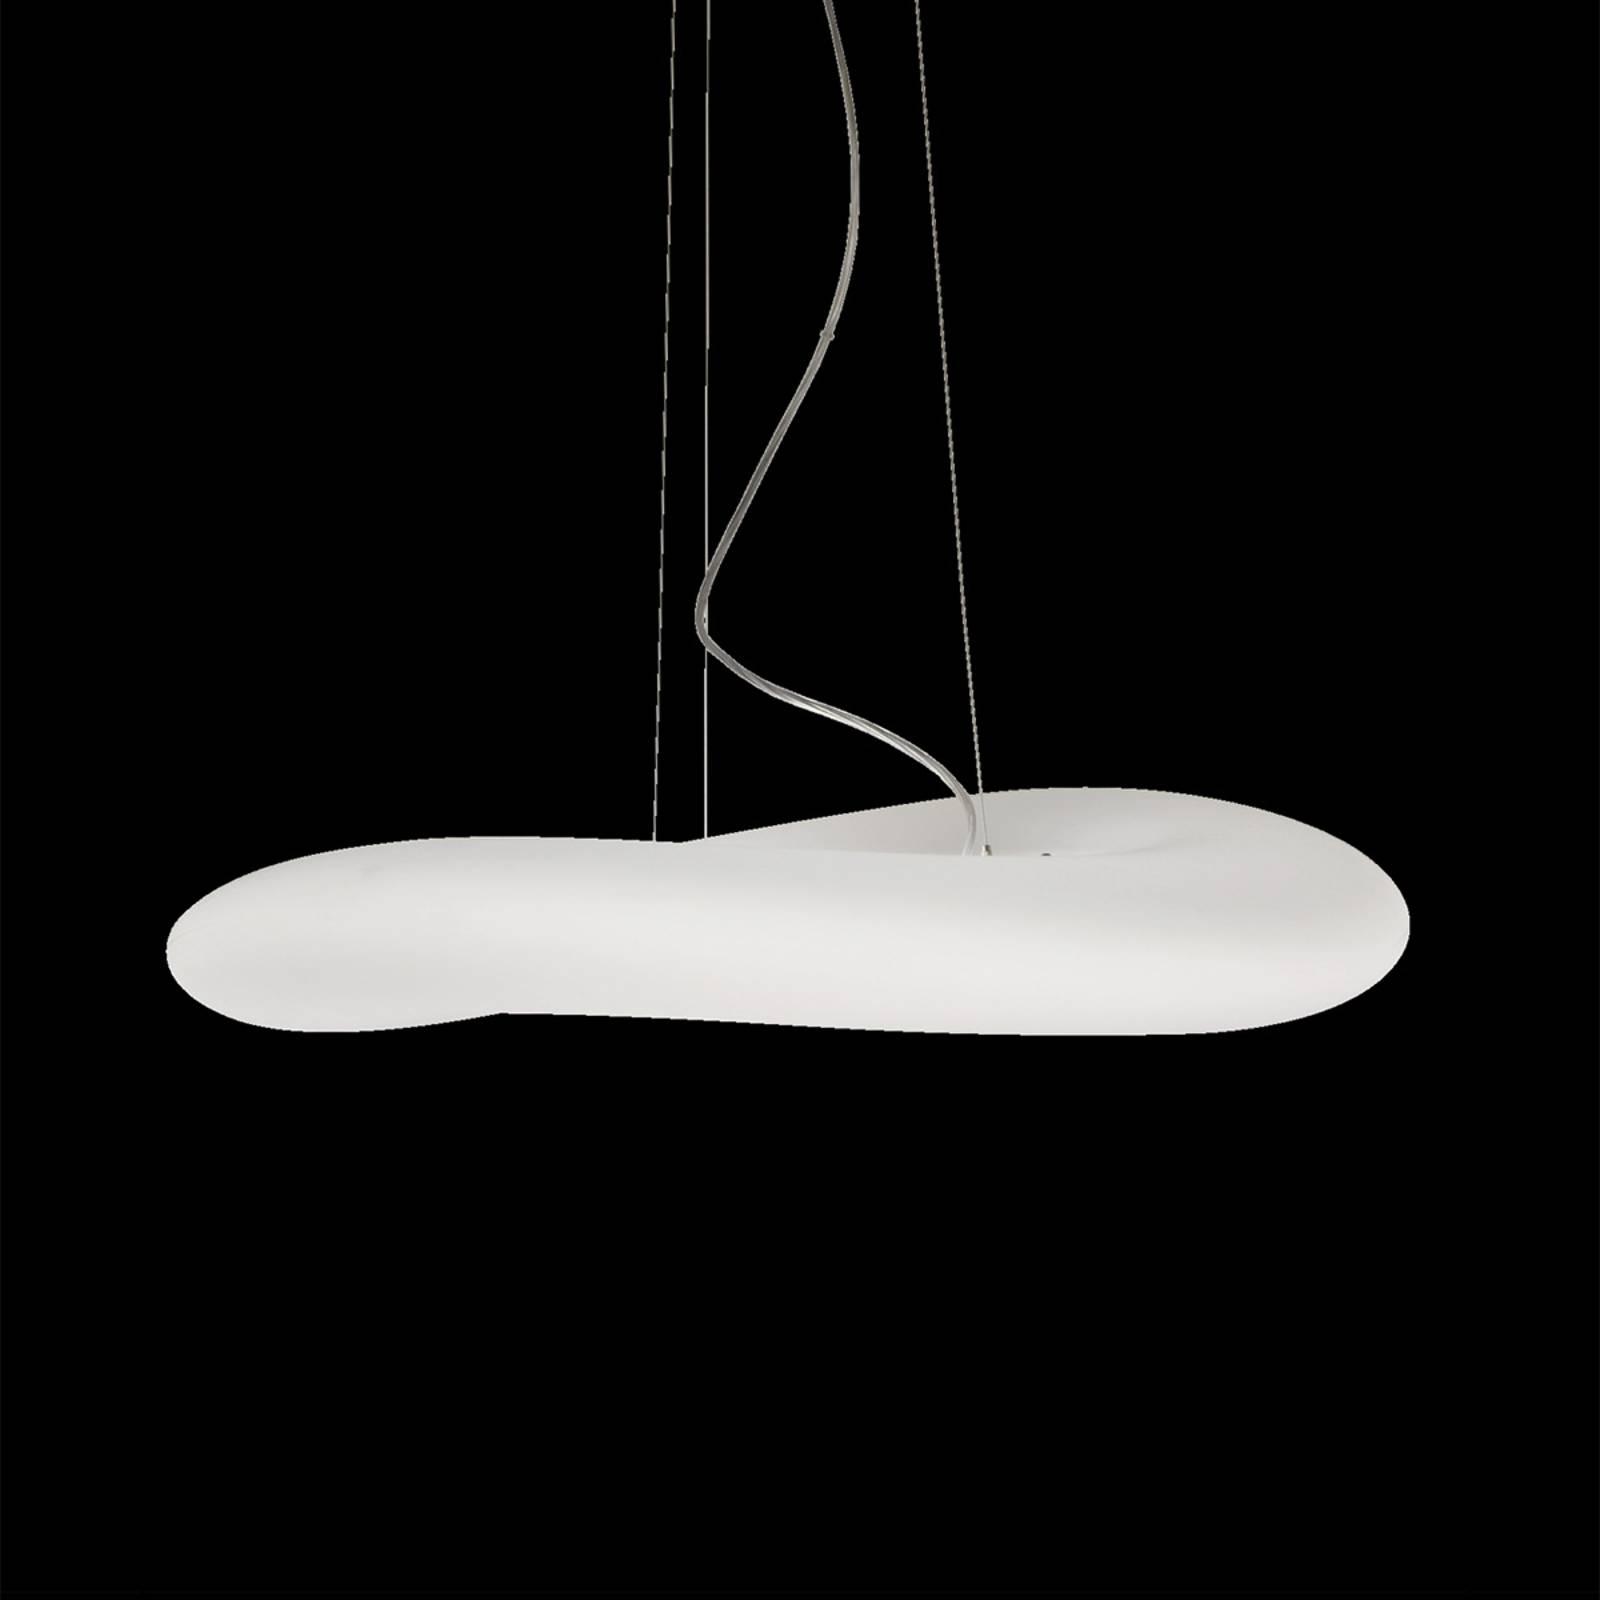 Lampa wisząca LED Mr. Magoo, 115 cm